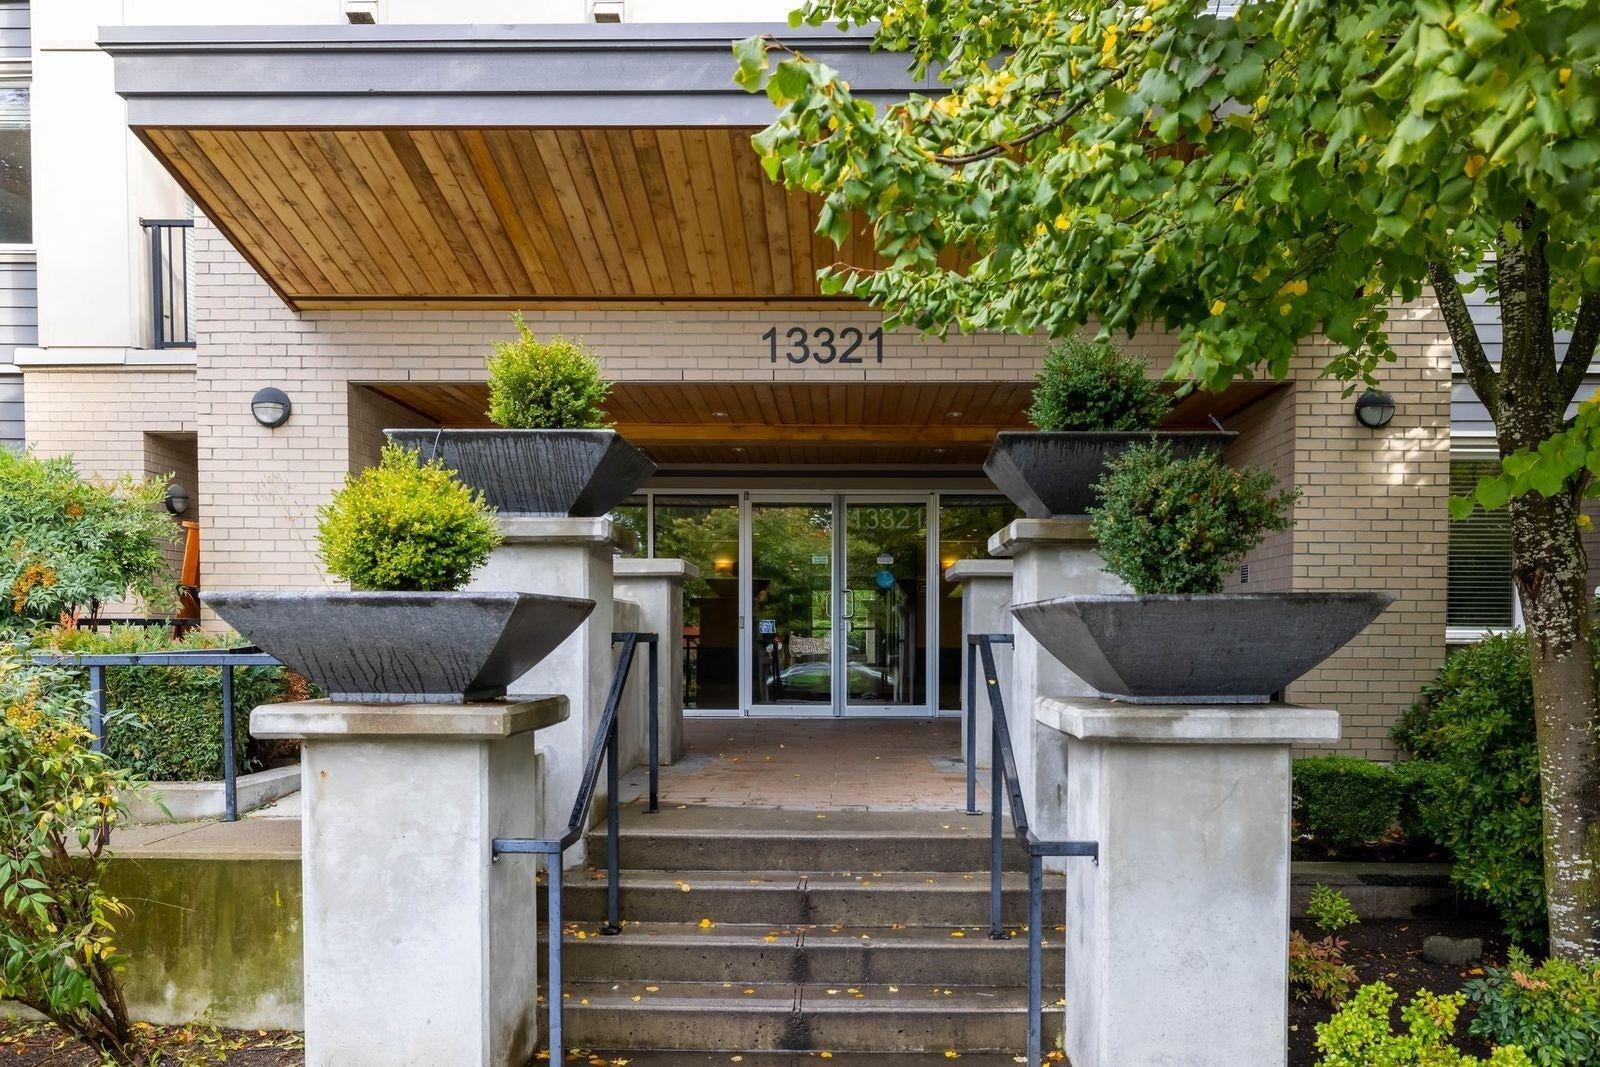 211 13321 102A AVENUE - Whalley Apartment/Condo for sale(R2625464)